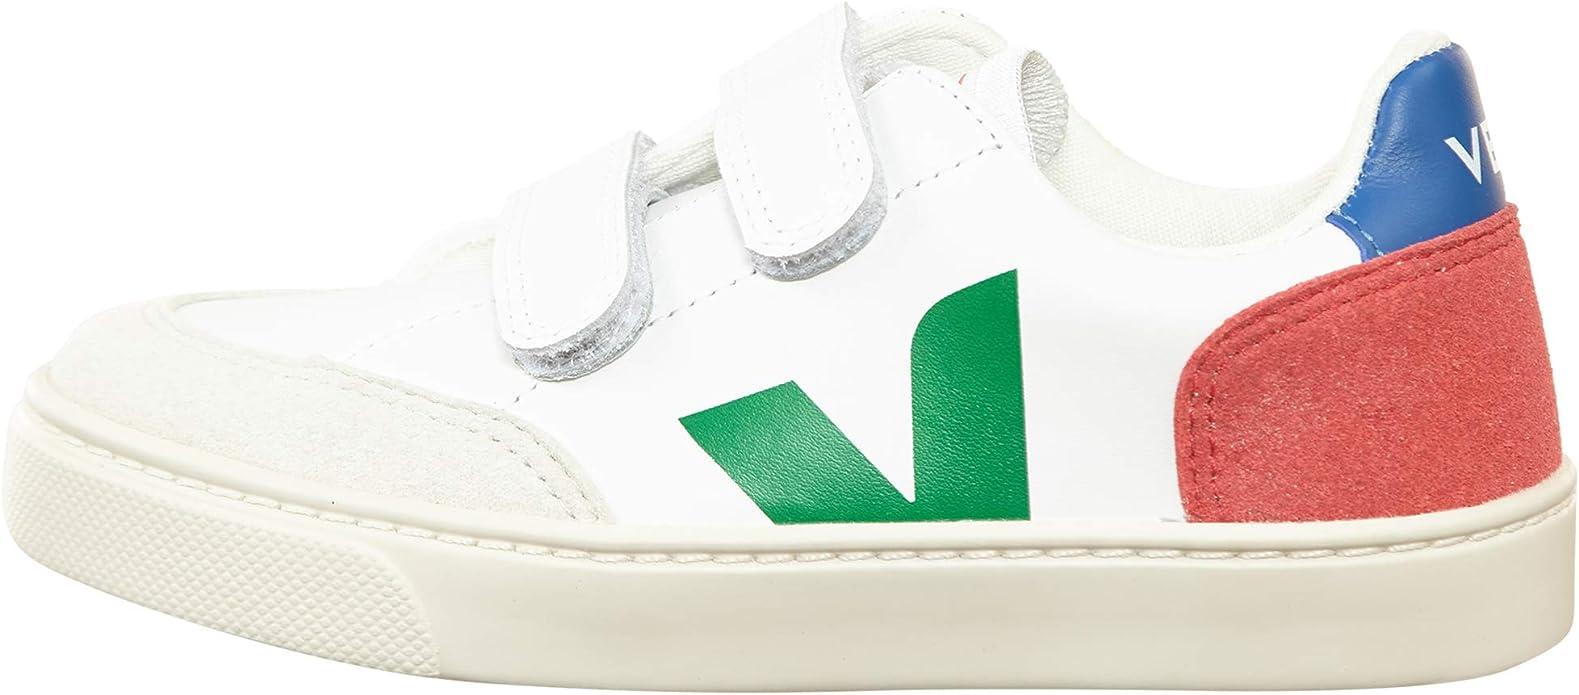 Veja Small V-12 Velcro Leather Big Kids